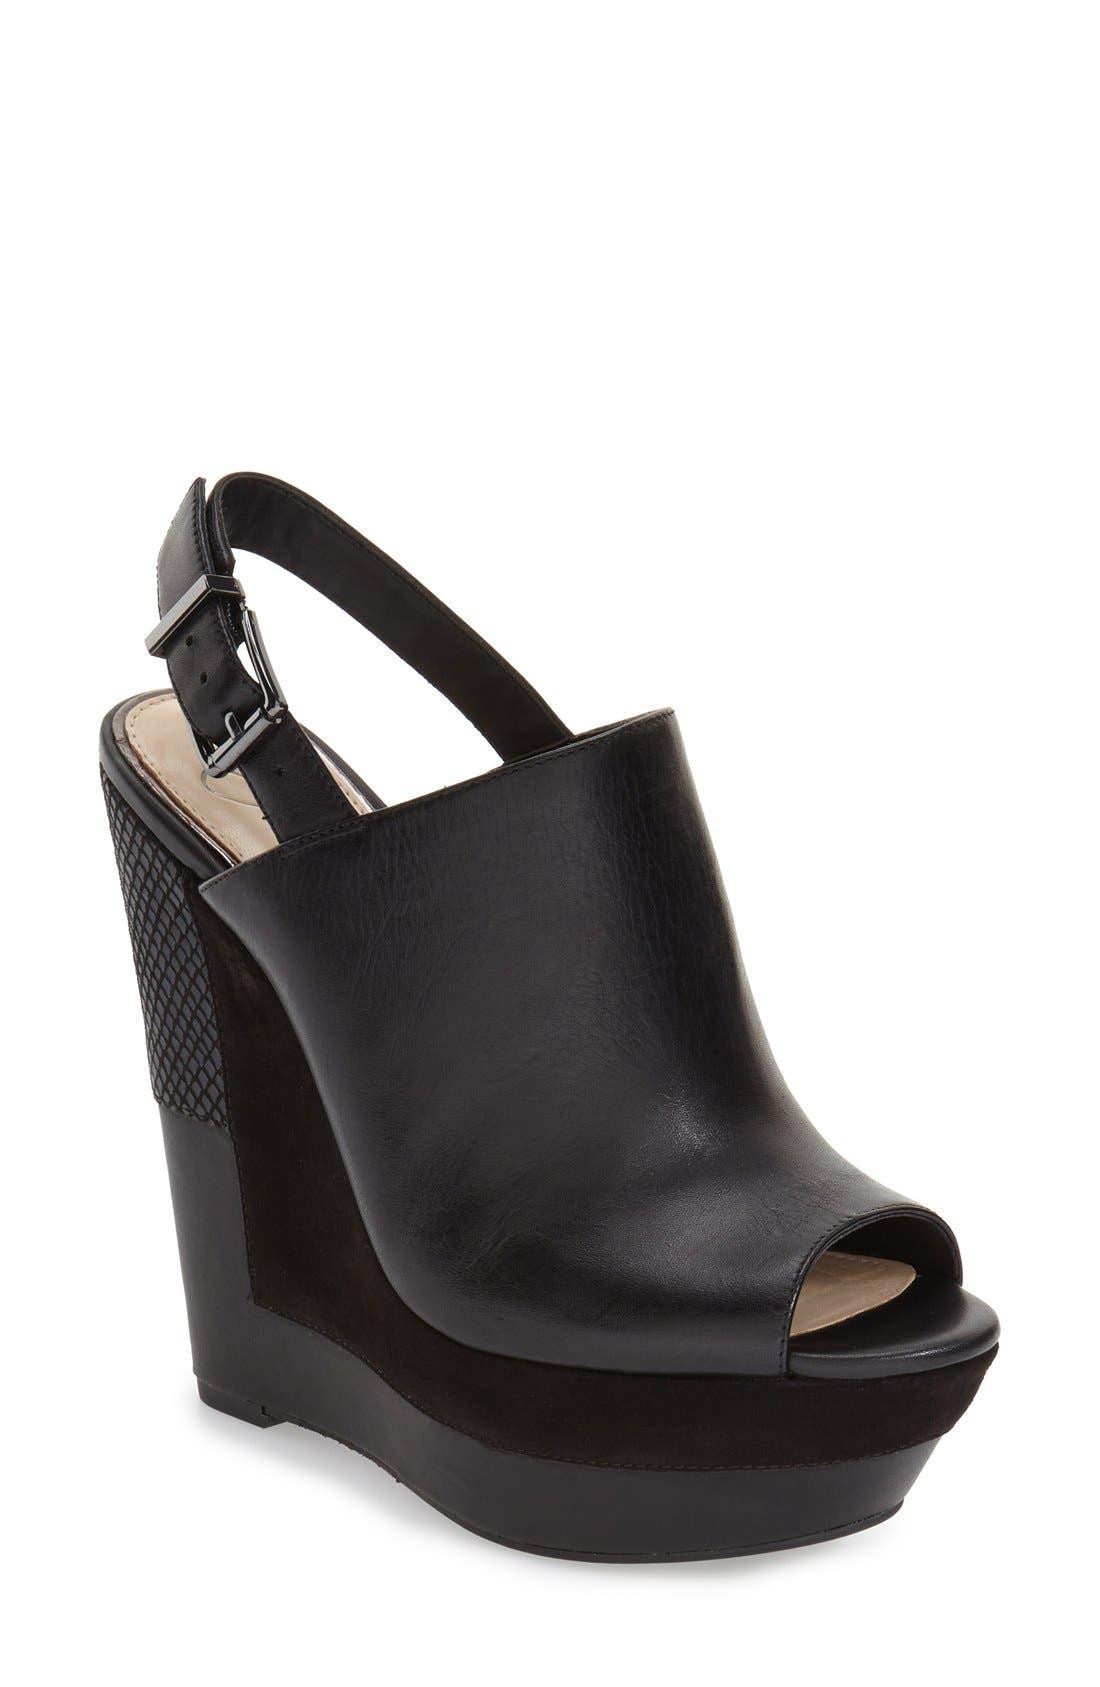 'Radina' Wedge Sandal, Main, color, 002